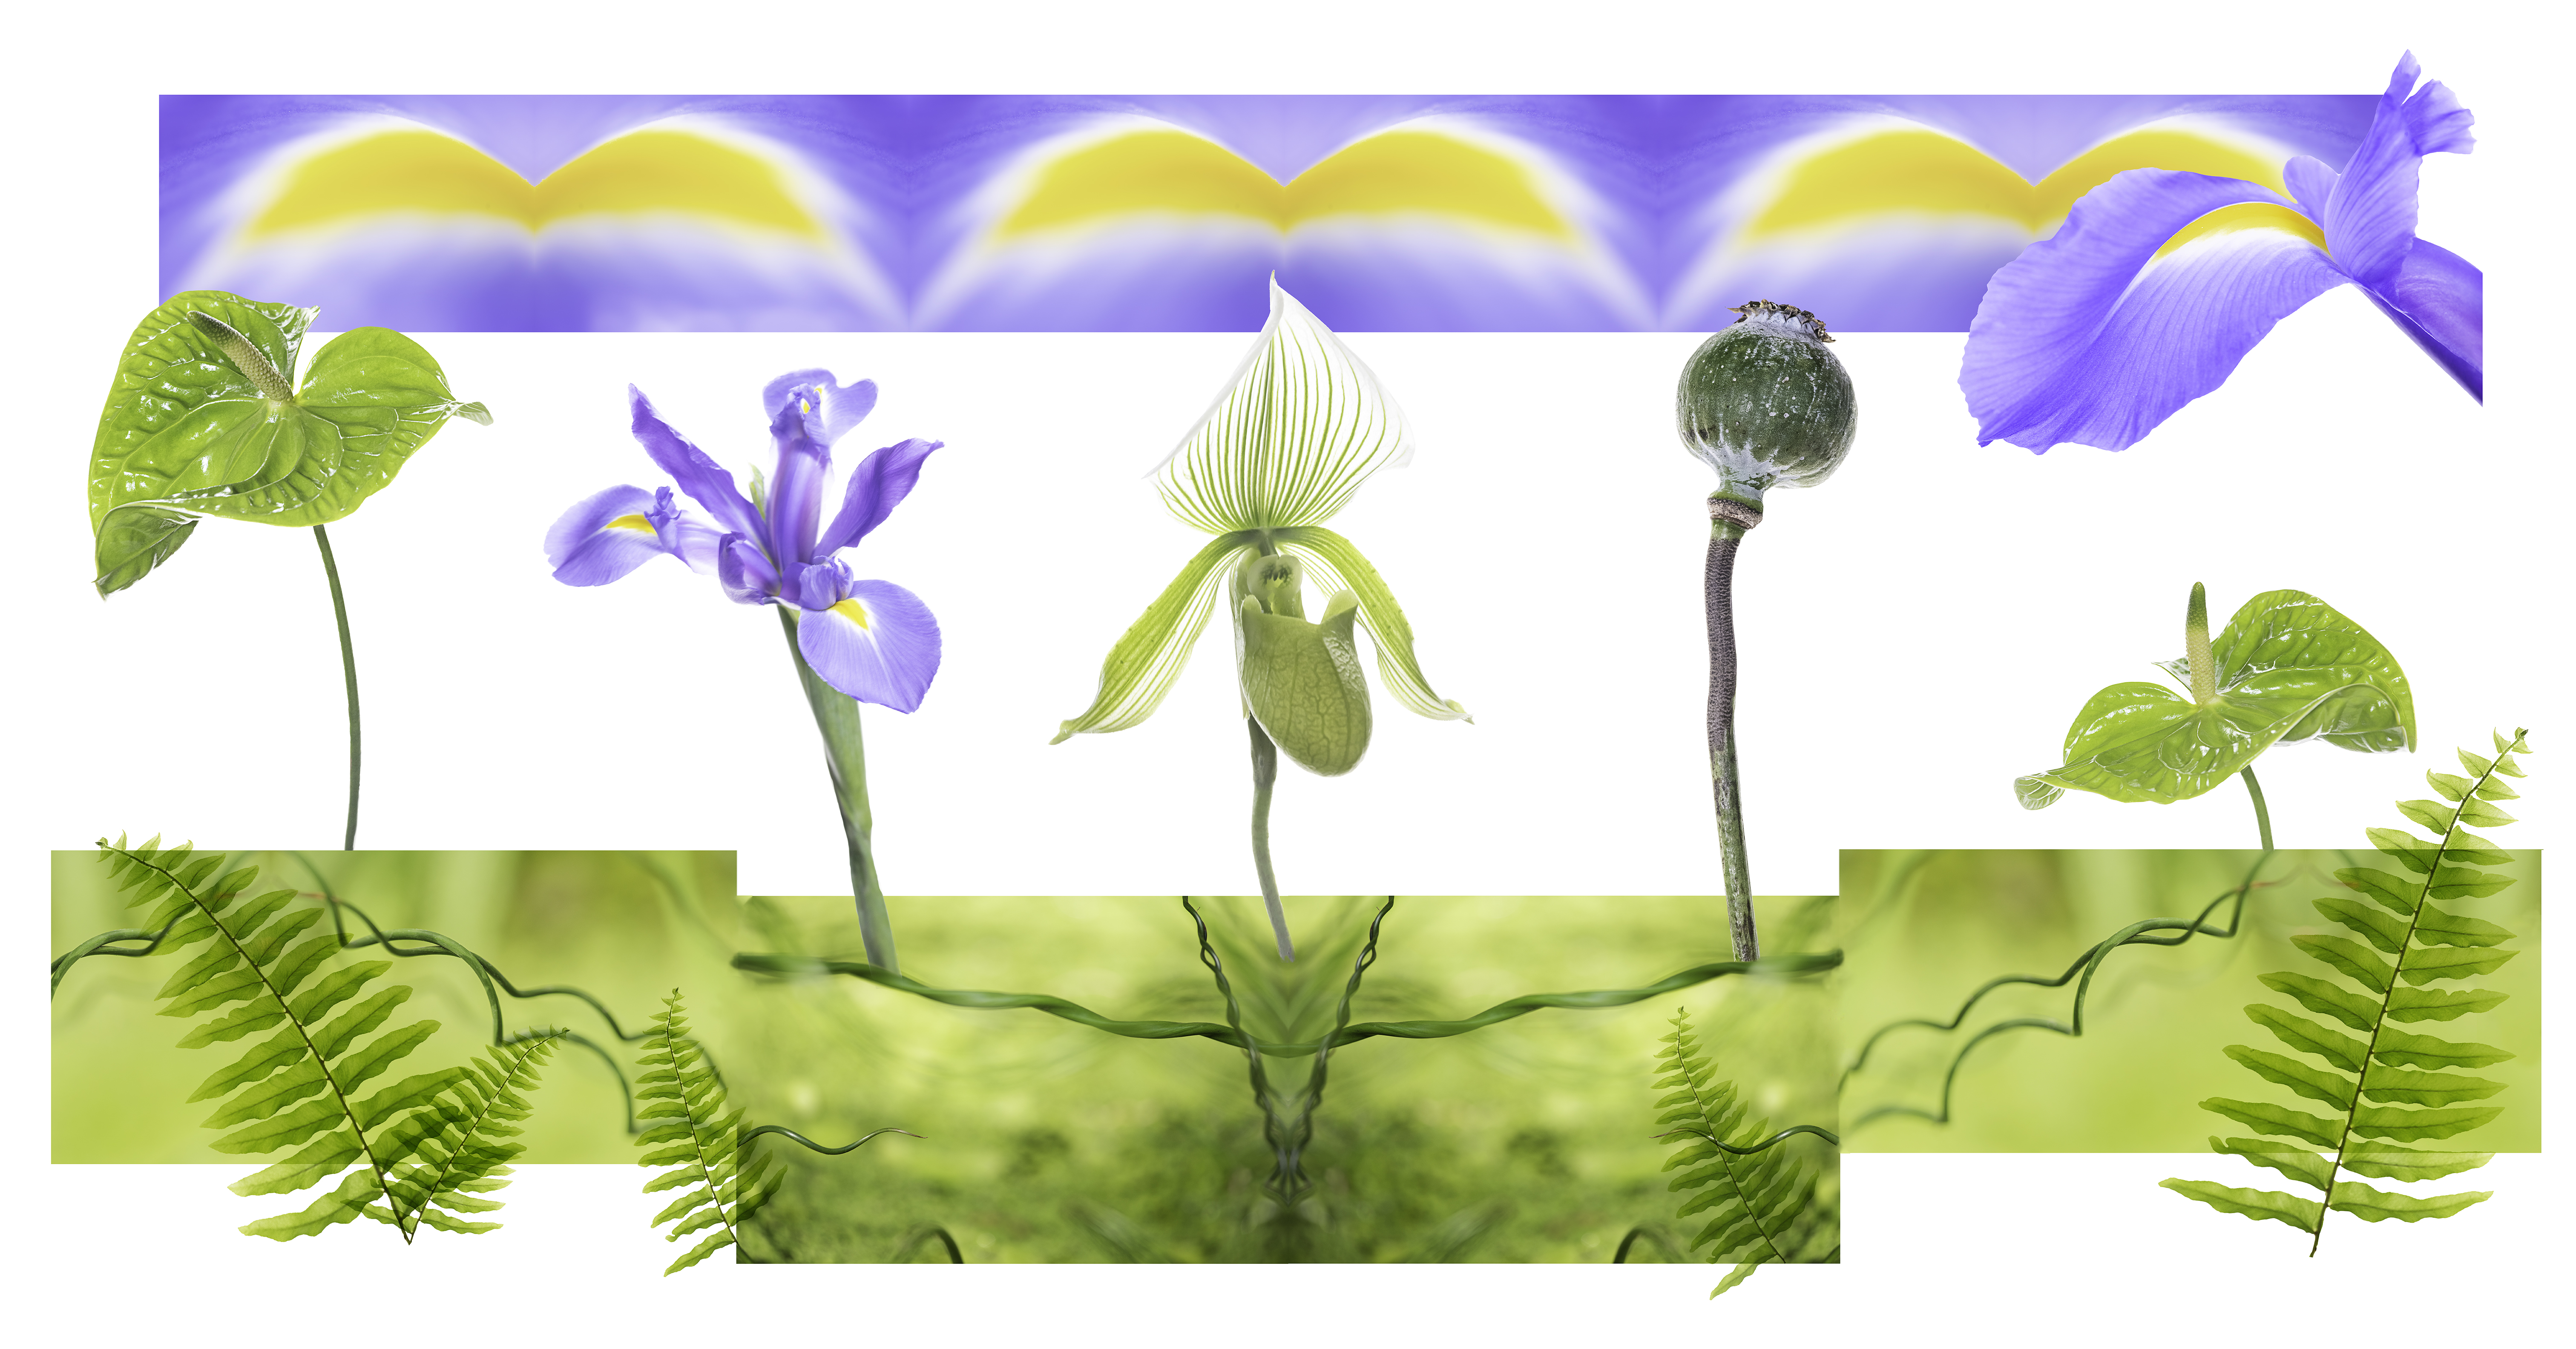 BotanicalExploration